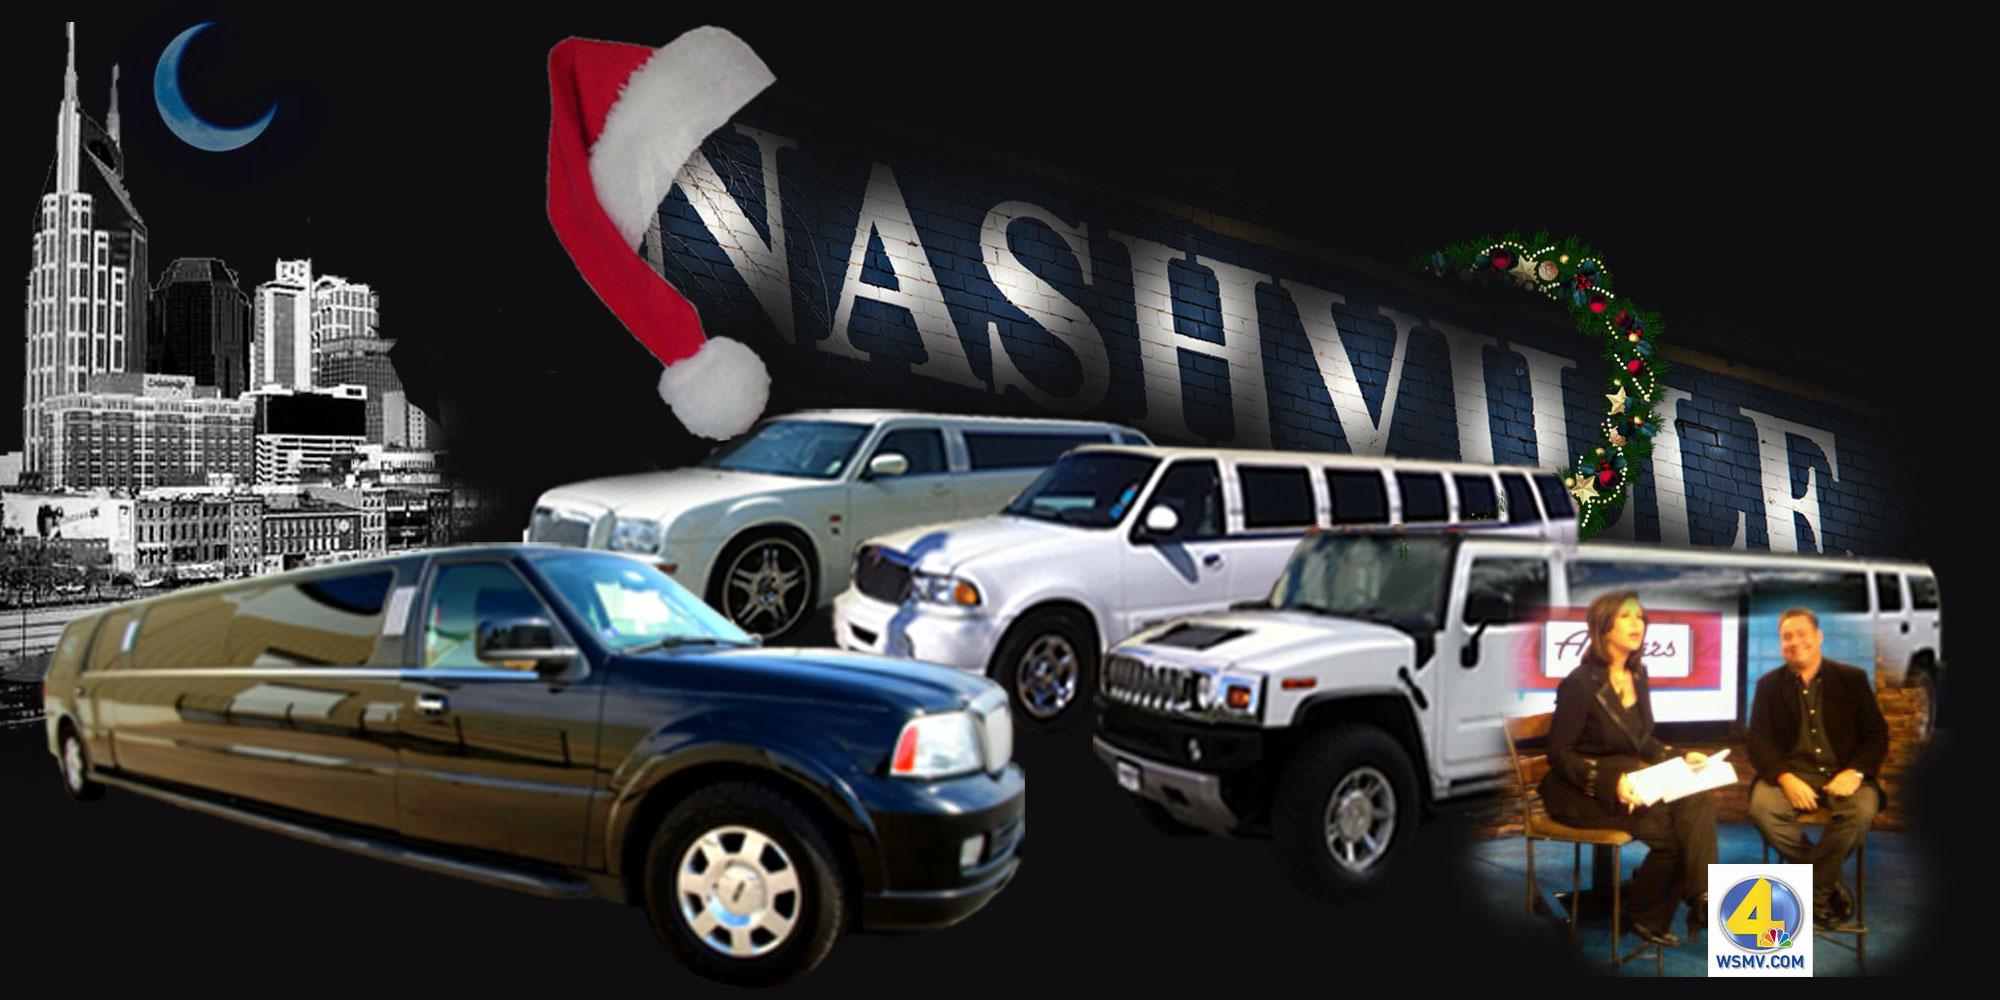 Holiday Lights Tour - Nashville, TN by Allstars Limousine